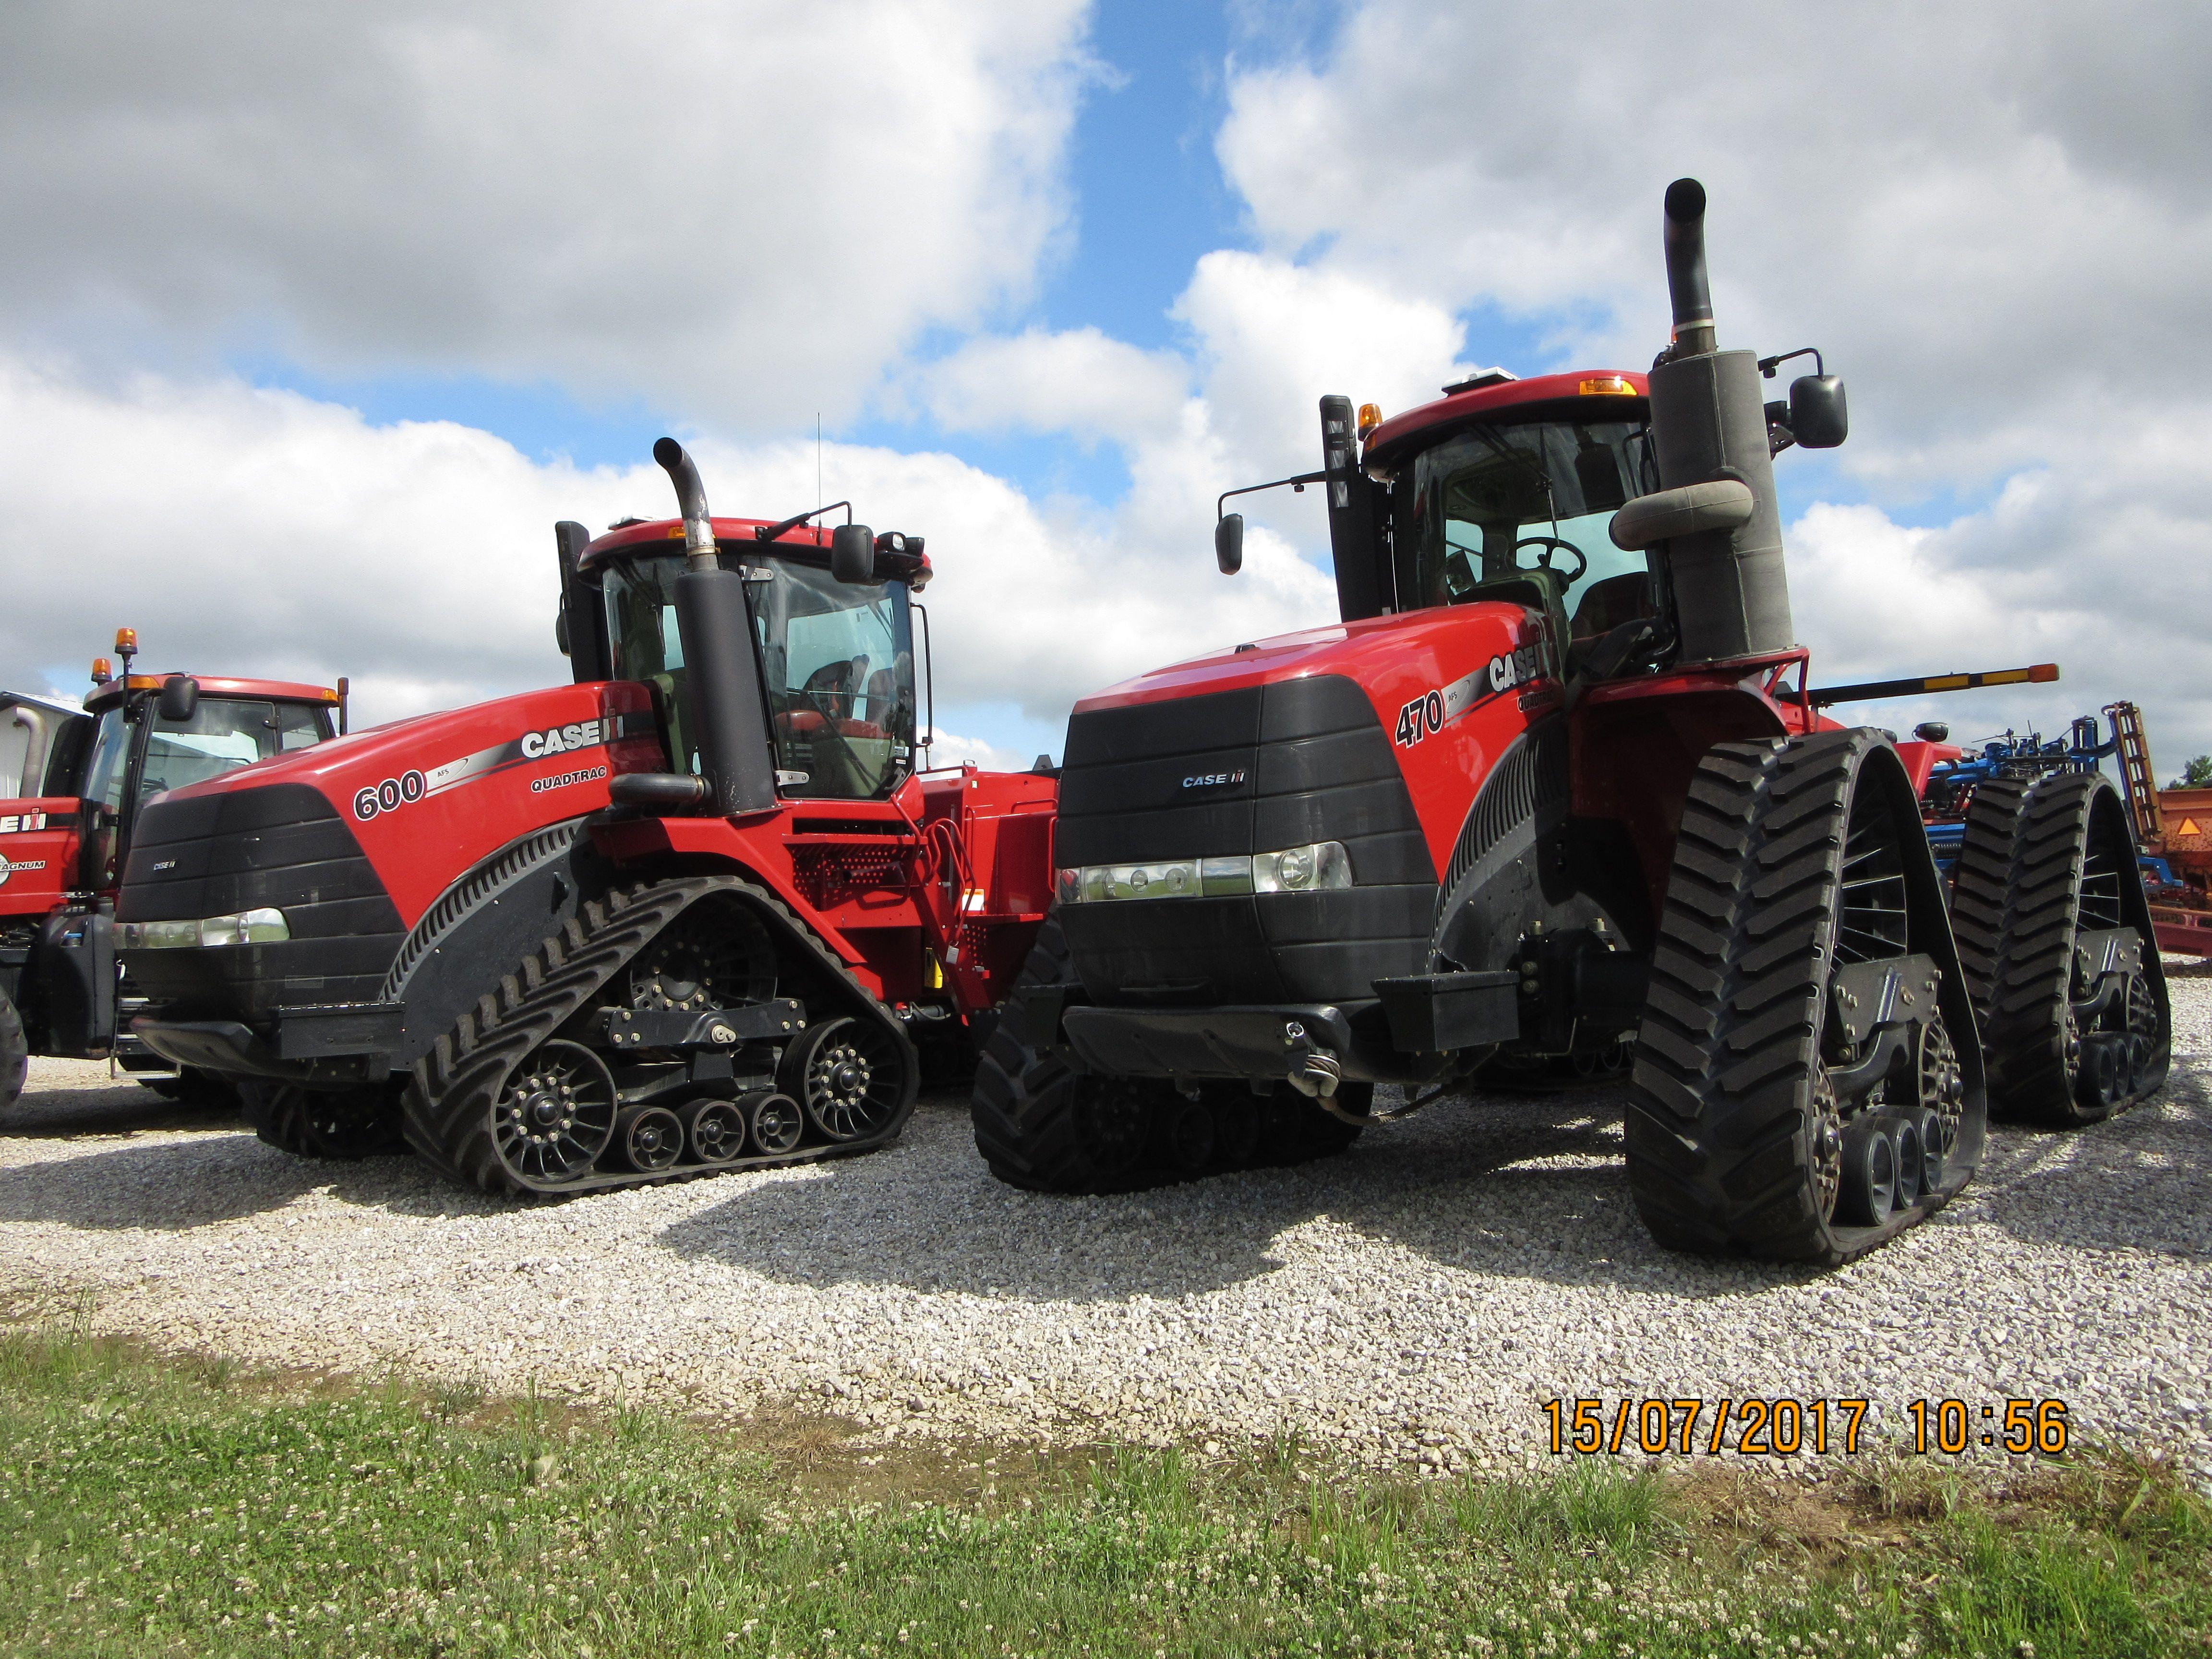 CaseIH Steiger 600 quadtrac & 470 rowtrac